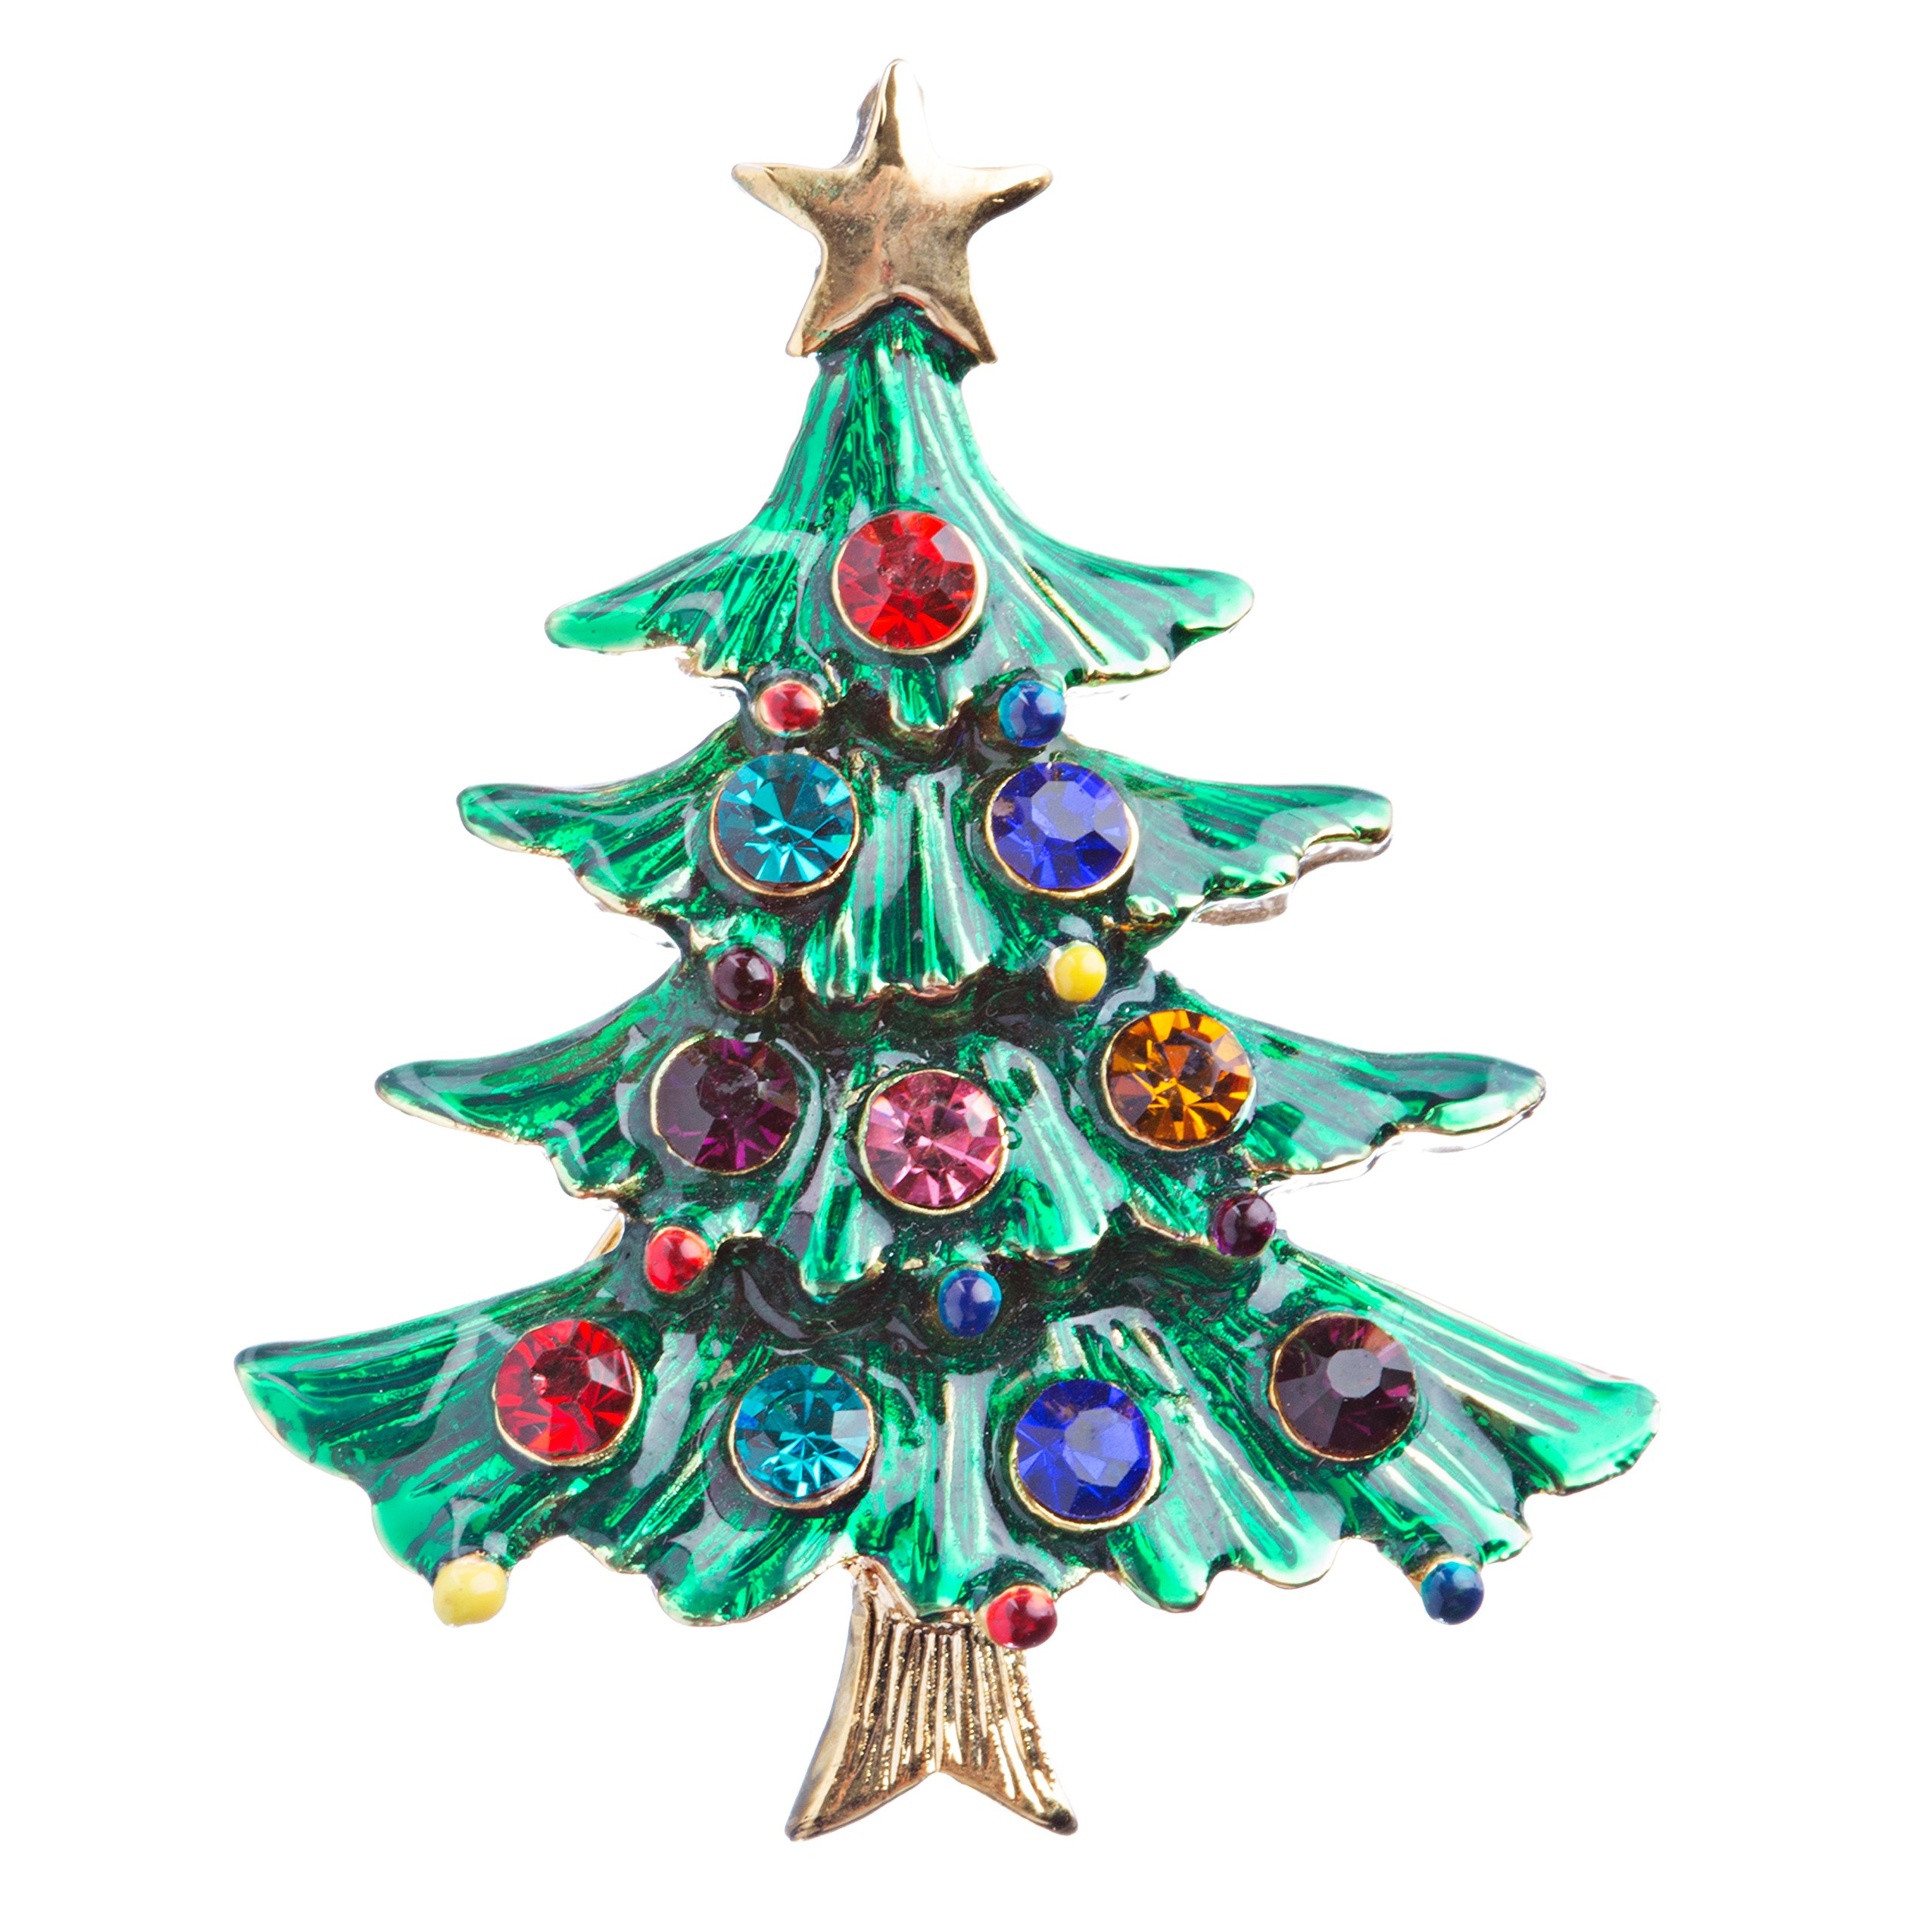 ACCESSORIESFOREVER Women Christmas Jewelry Crystal Rhinestone Dazzle Tree Charm Brooch Pin BH118 Green